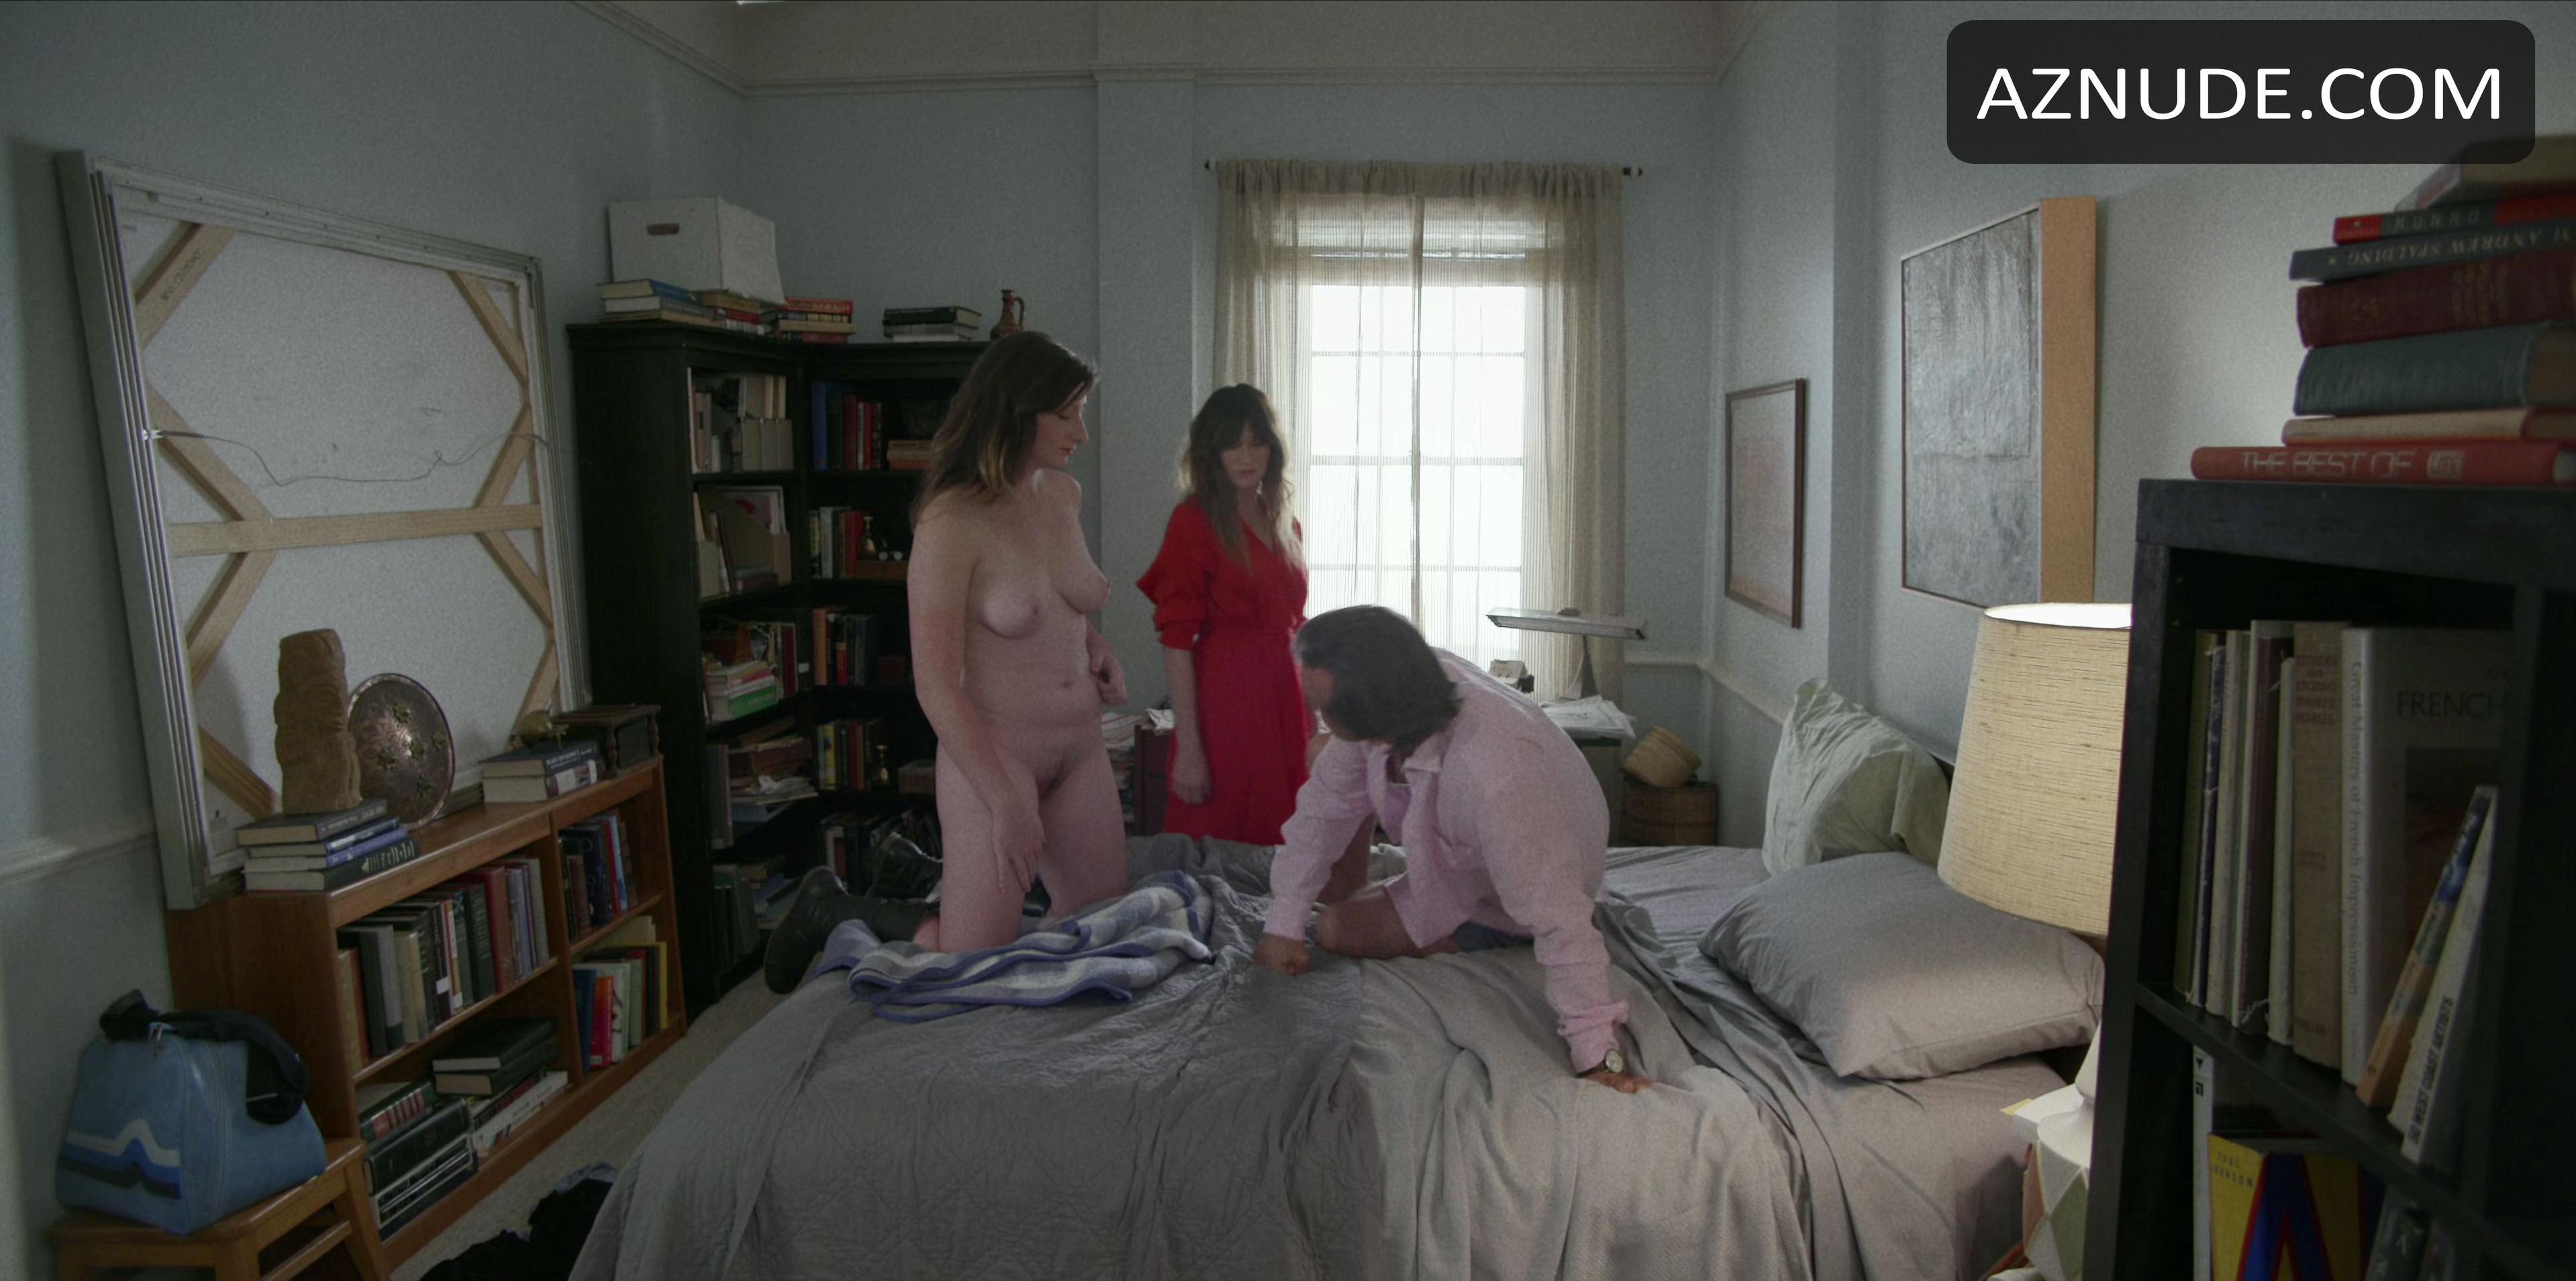 Kristen stewart nude sex scene in on the road scandalplanet - 1 part 7